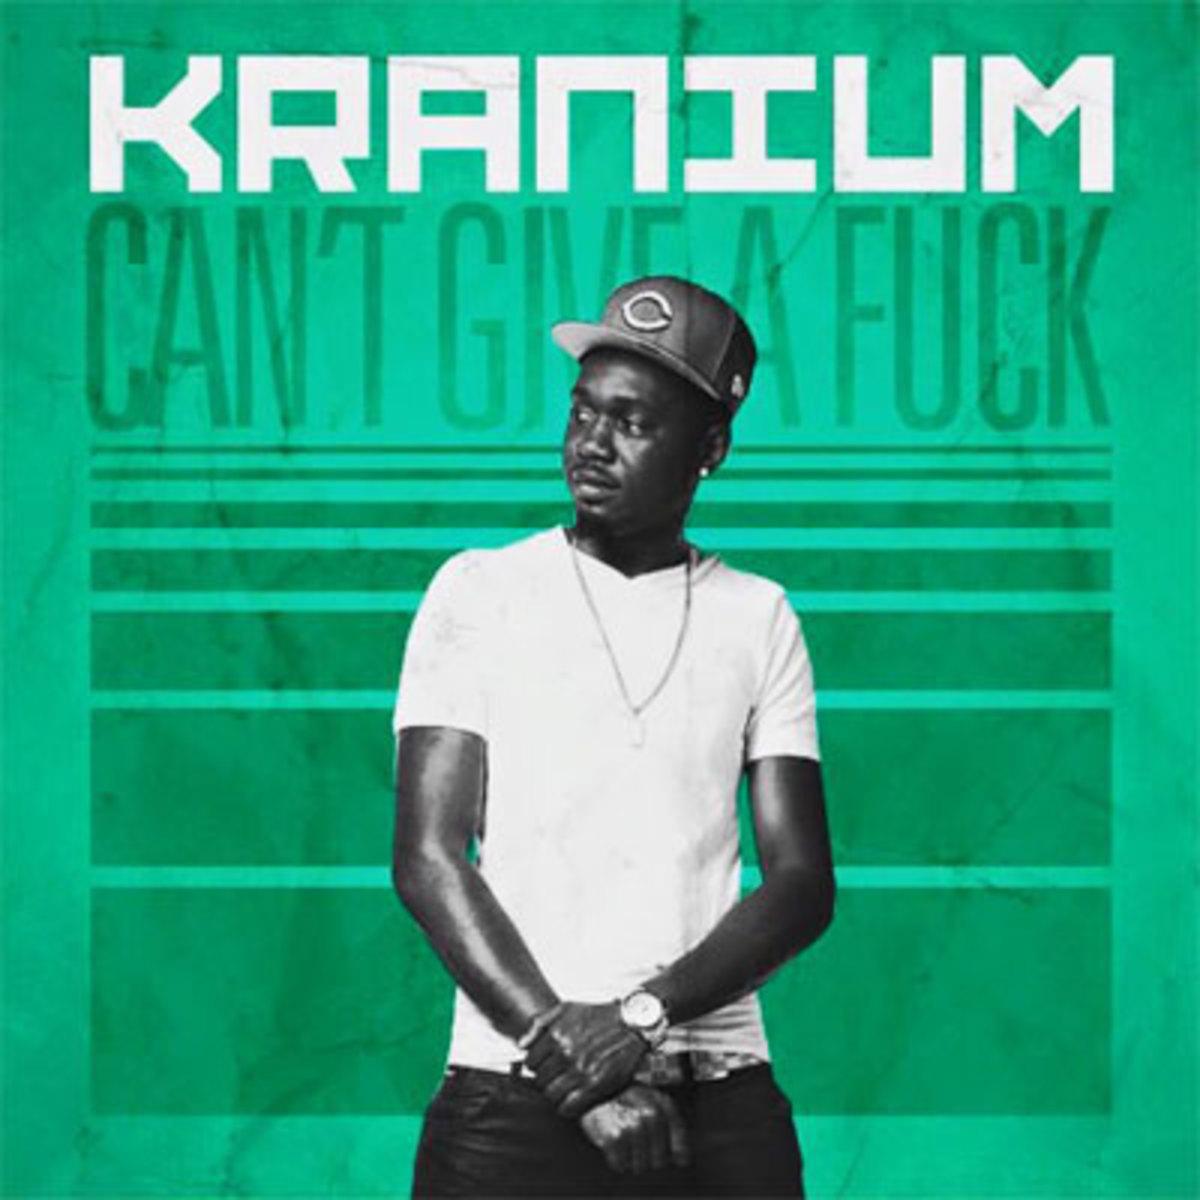 kranium-cant-give-a-fck.jpg